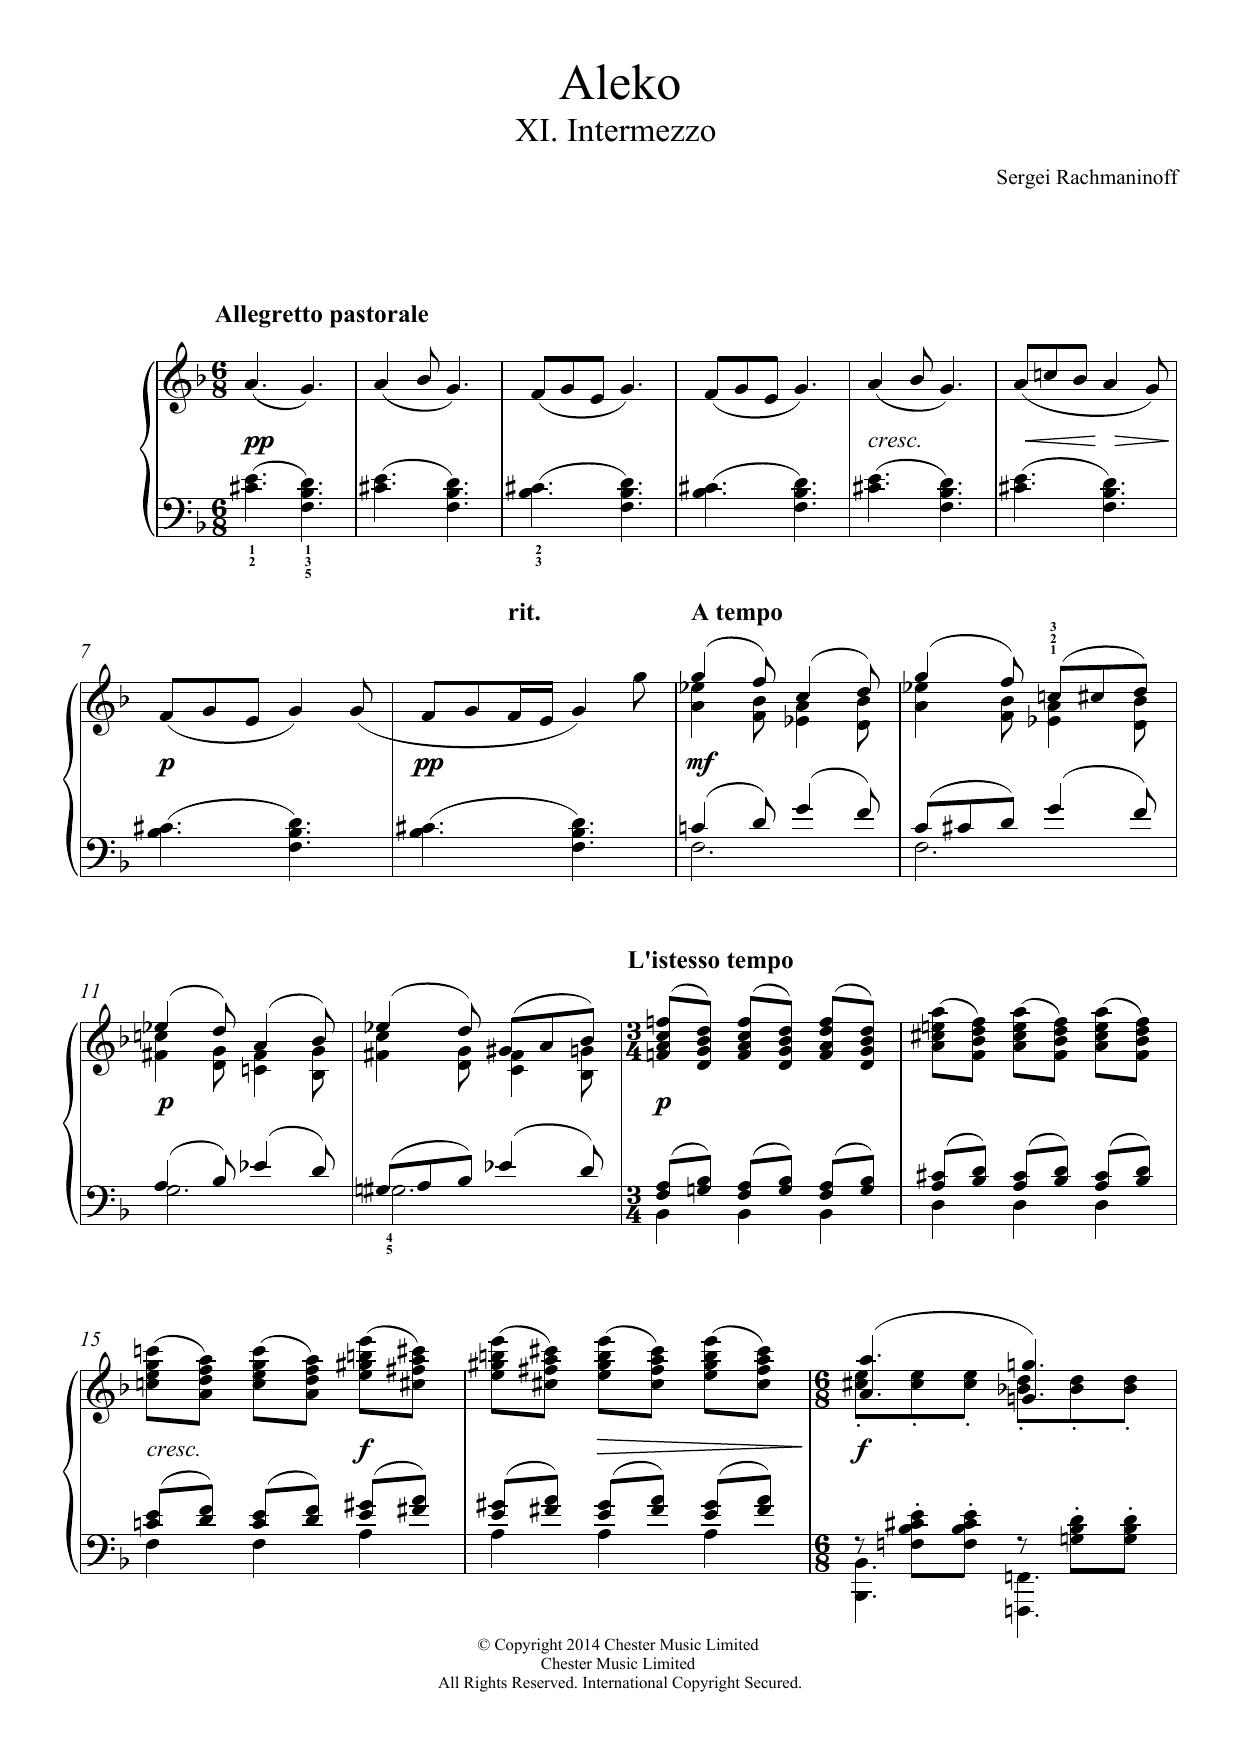 Sergei Rachmaninoff - Aleko - No.11 Intermezzo